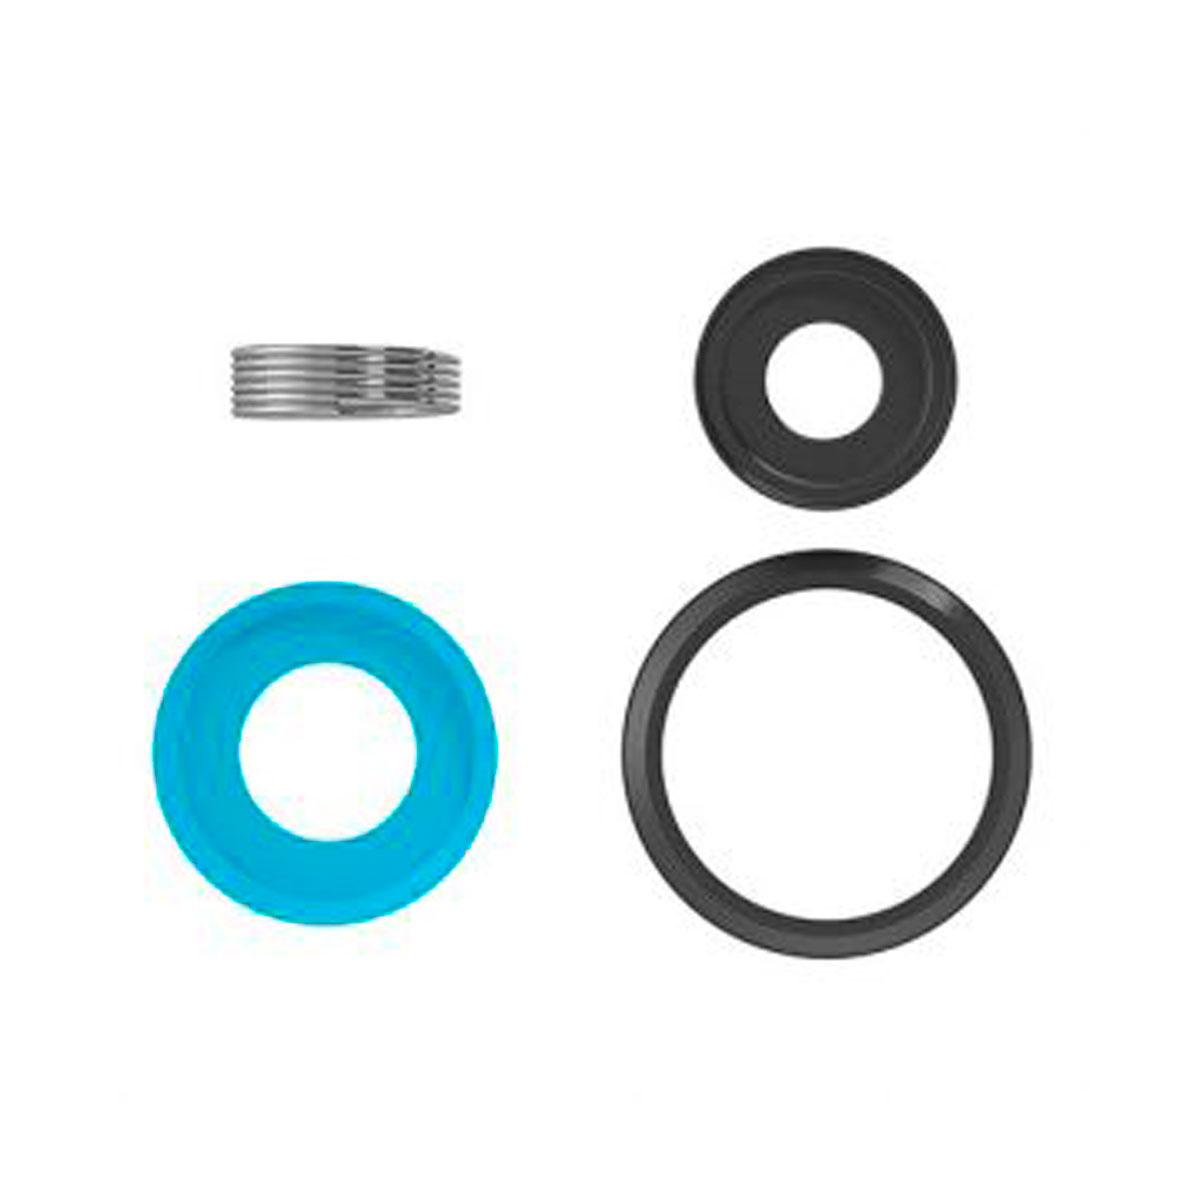 Reparo Válvula Hydra Luxo/Master 1.1/4 Censi